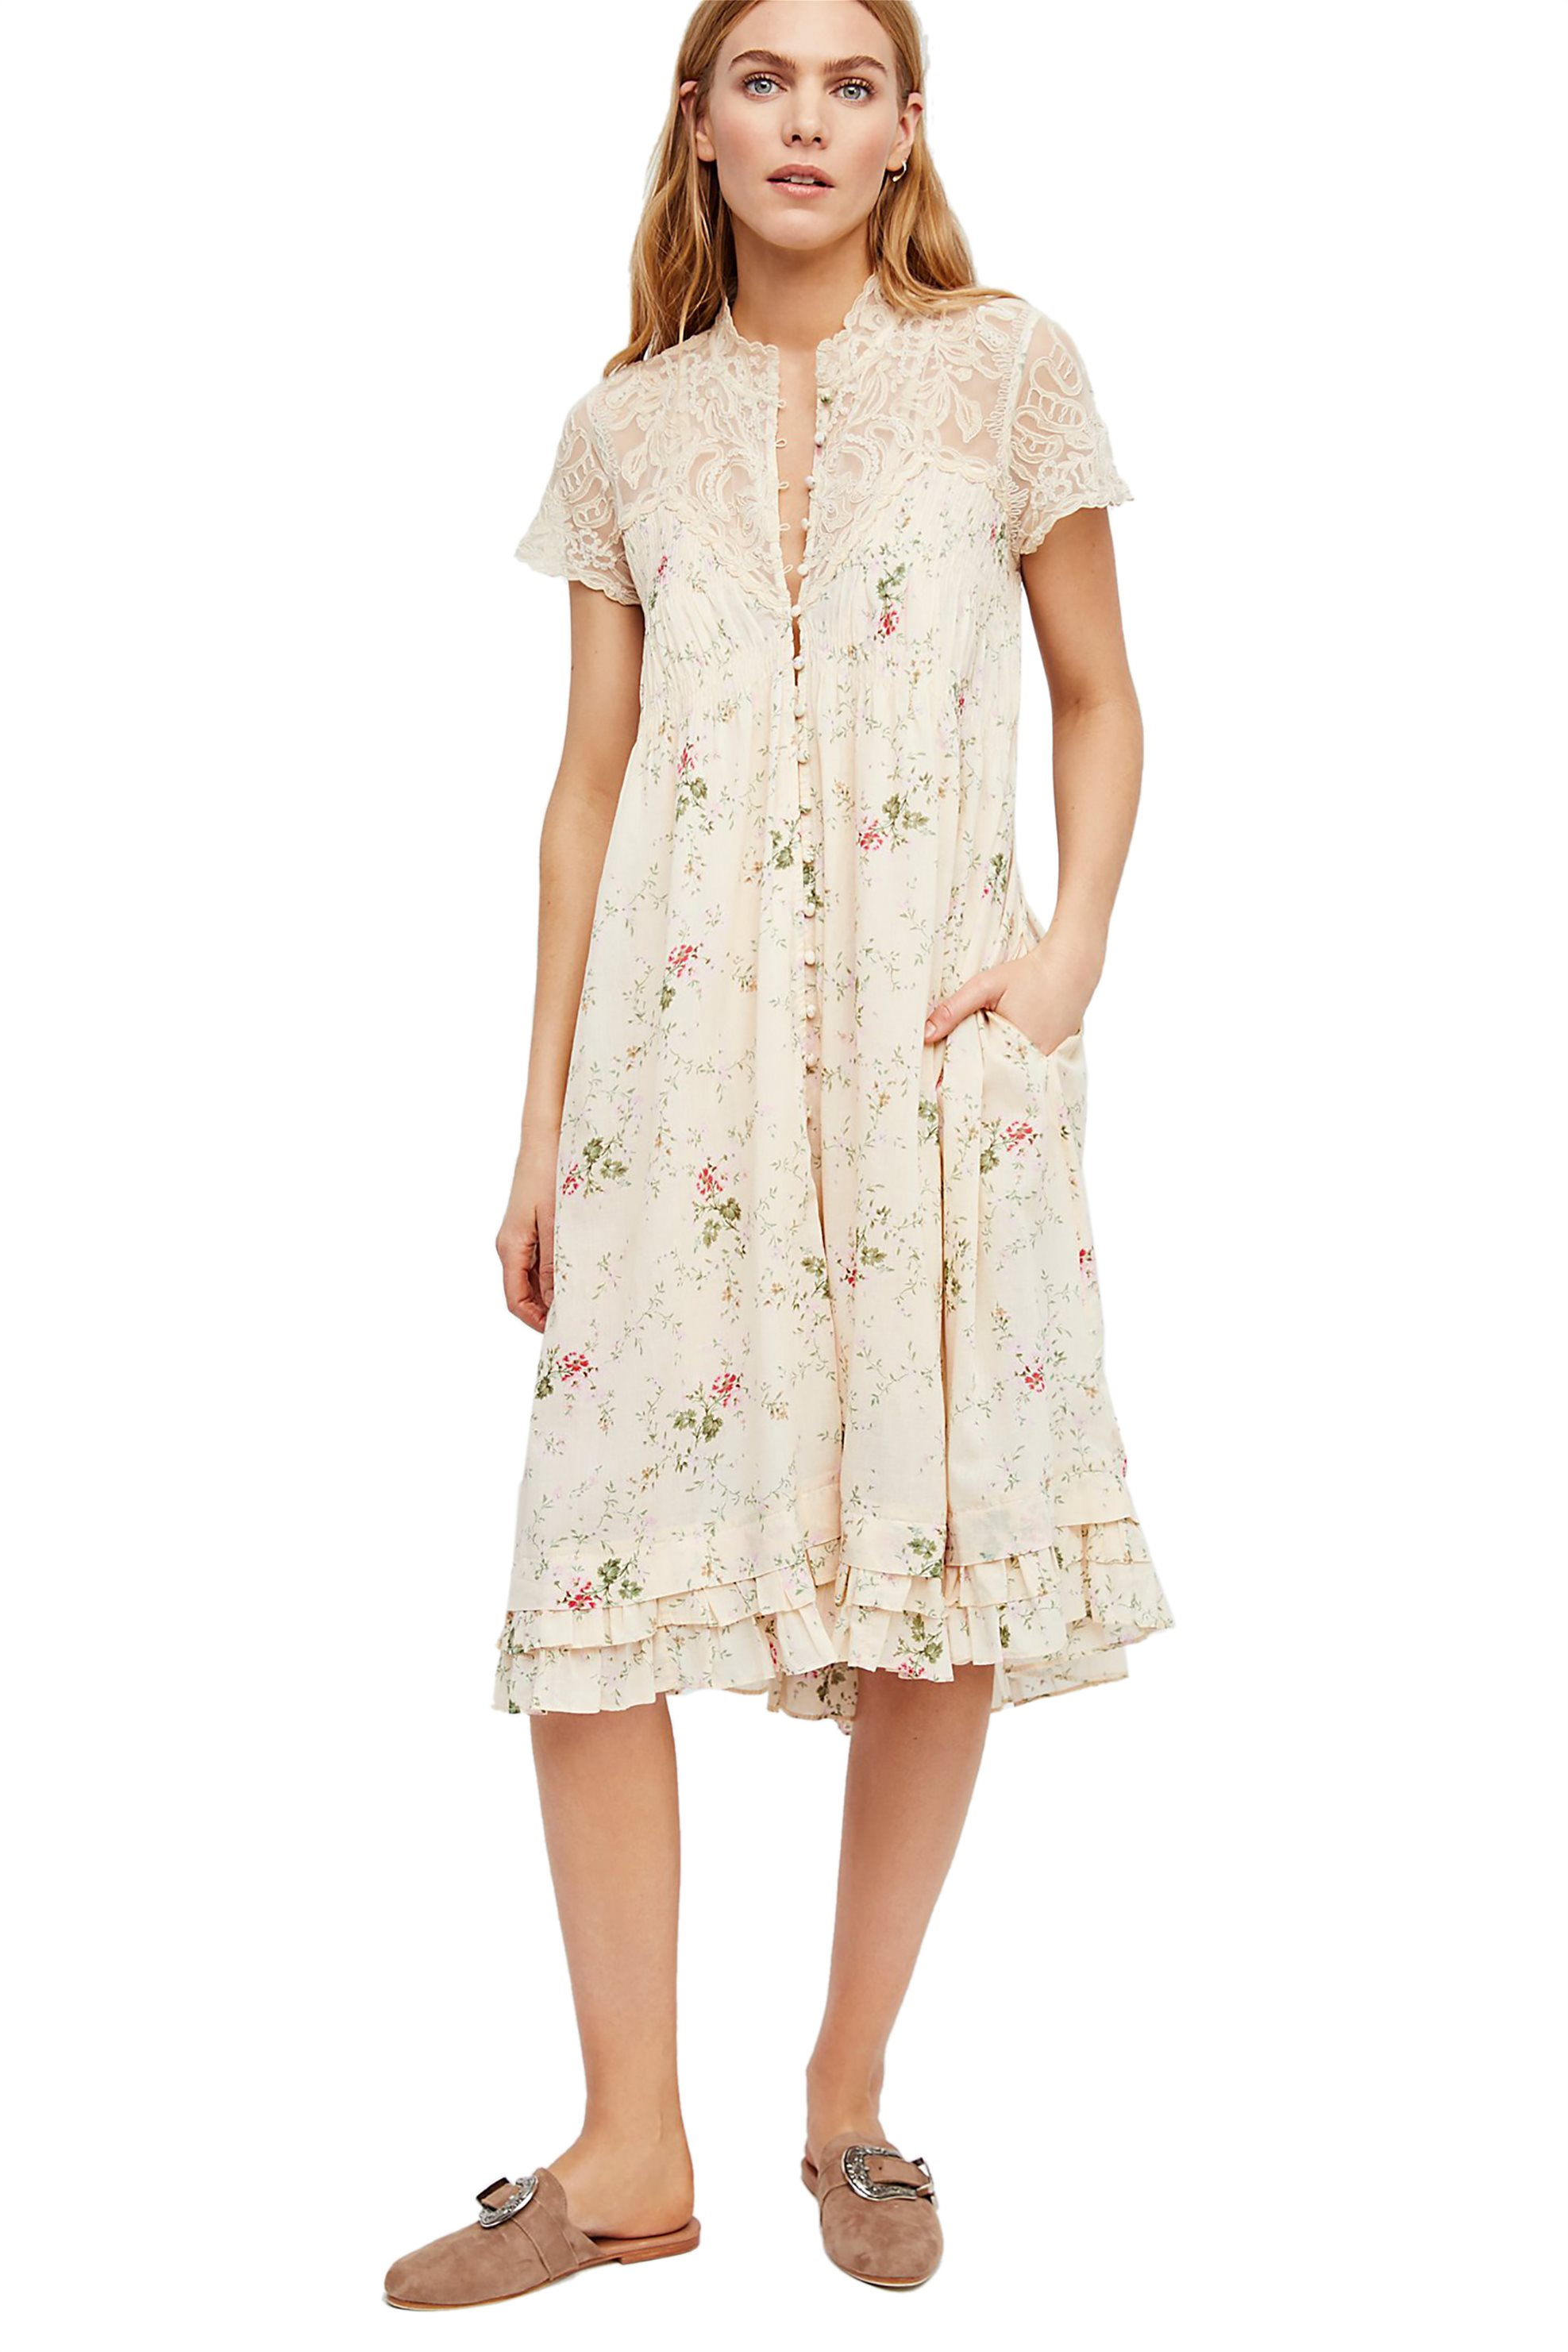 4001fdc561aa Γυναικεία   Ρούχα   Φορέματα   Καθημερινά   Φόρεμα καλοκαιρινό κοντό ...